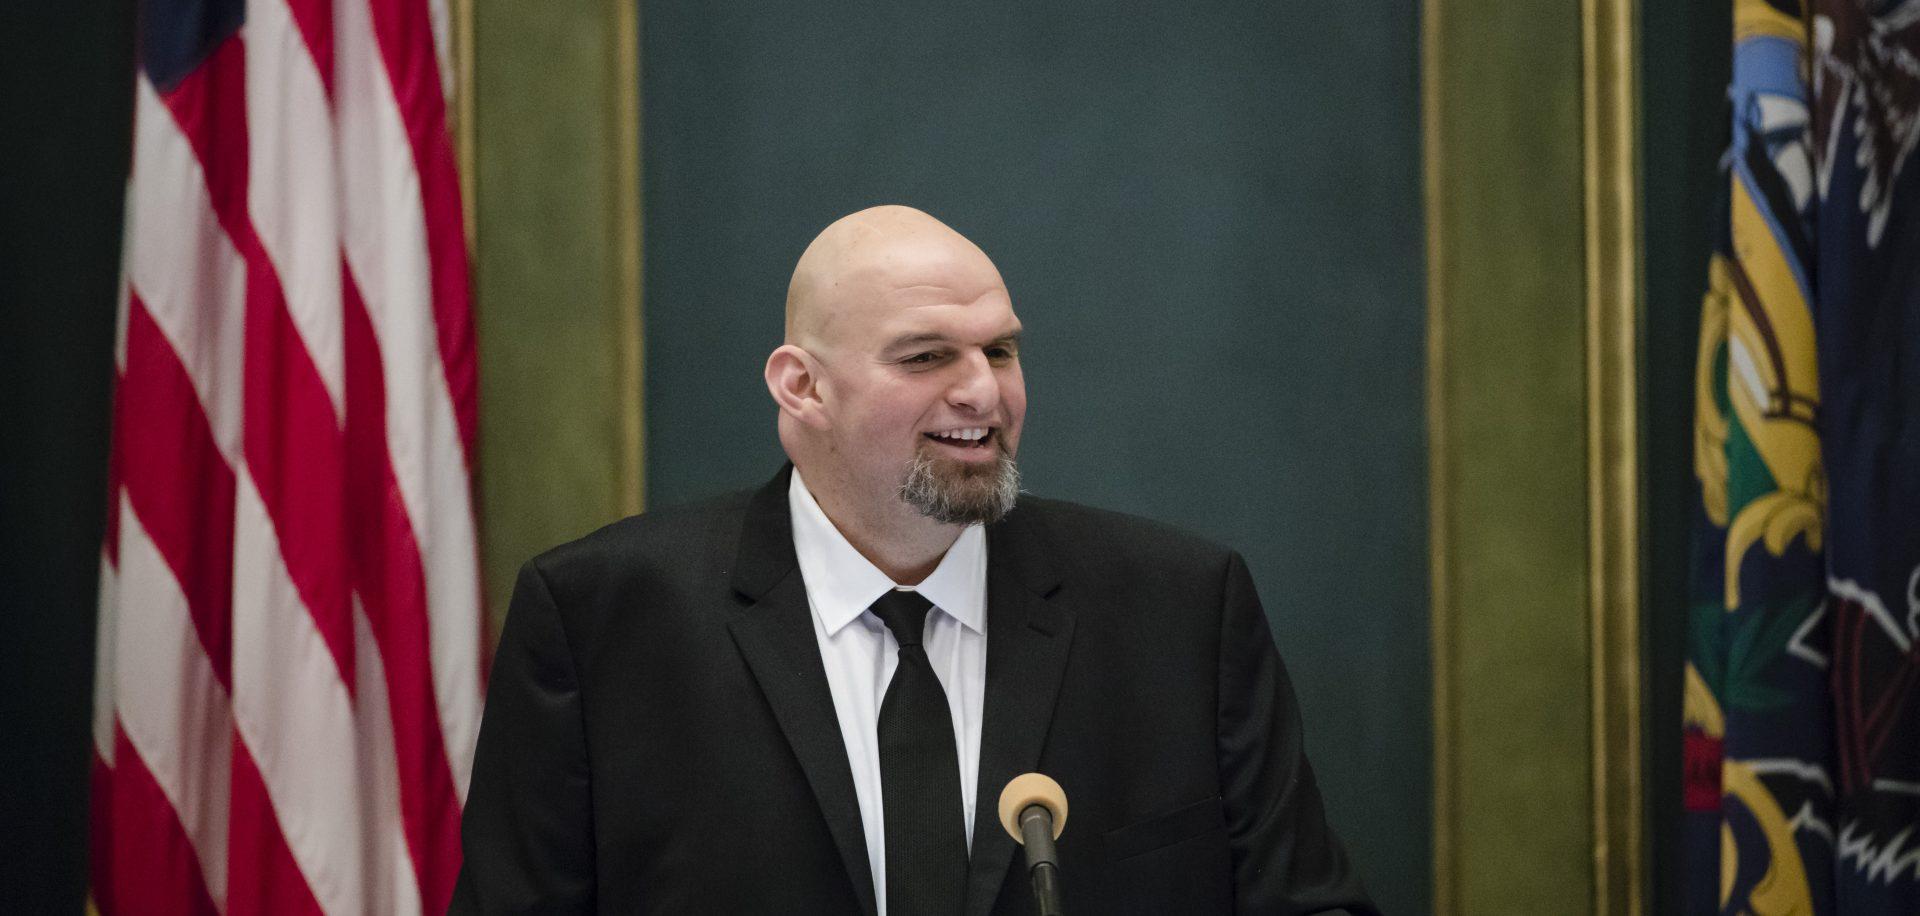 Fetterman dwarfs competition in Senate fundraising